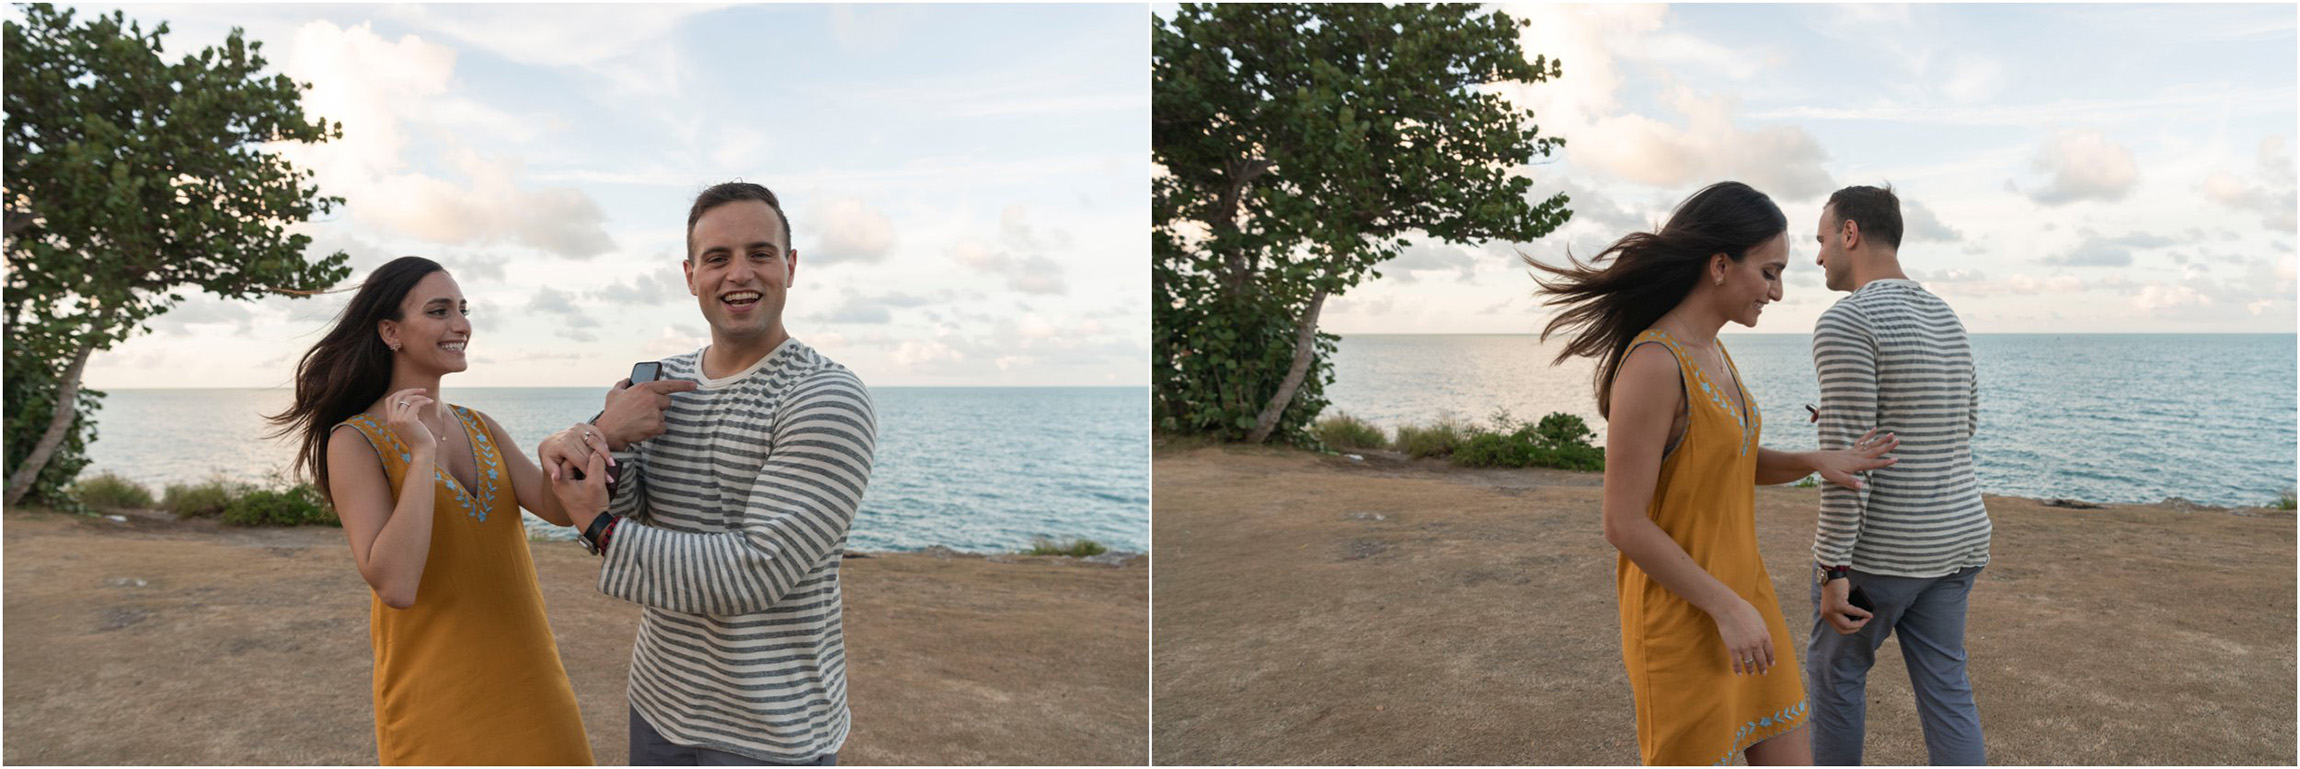 ©FianderFoto_Proposal Photographer_Bermuda_Admiralty House_Kresnick_Rina_007.jpg